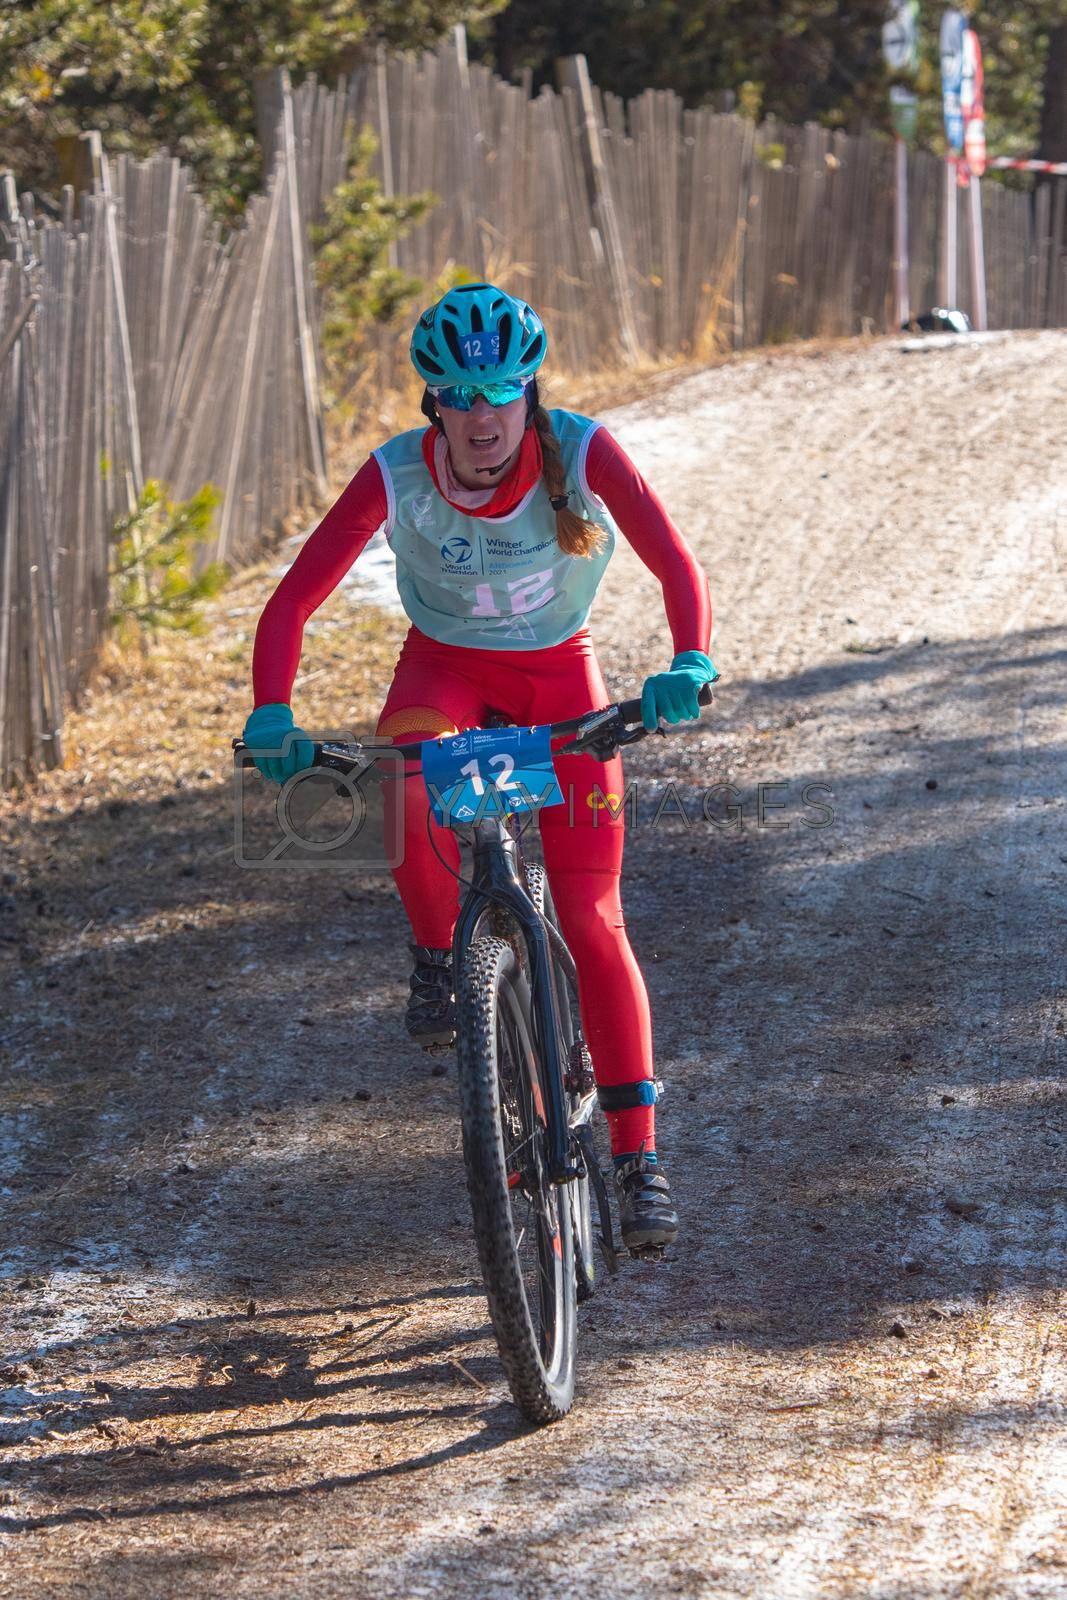 Naturlandia, Andorra : 2021 March 20 : Marta Borbon ESP in the 2021 World Triathlon Winter Championships Andorra